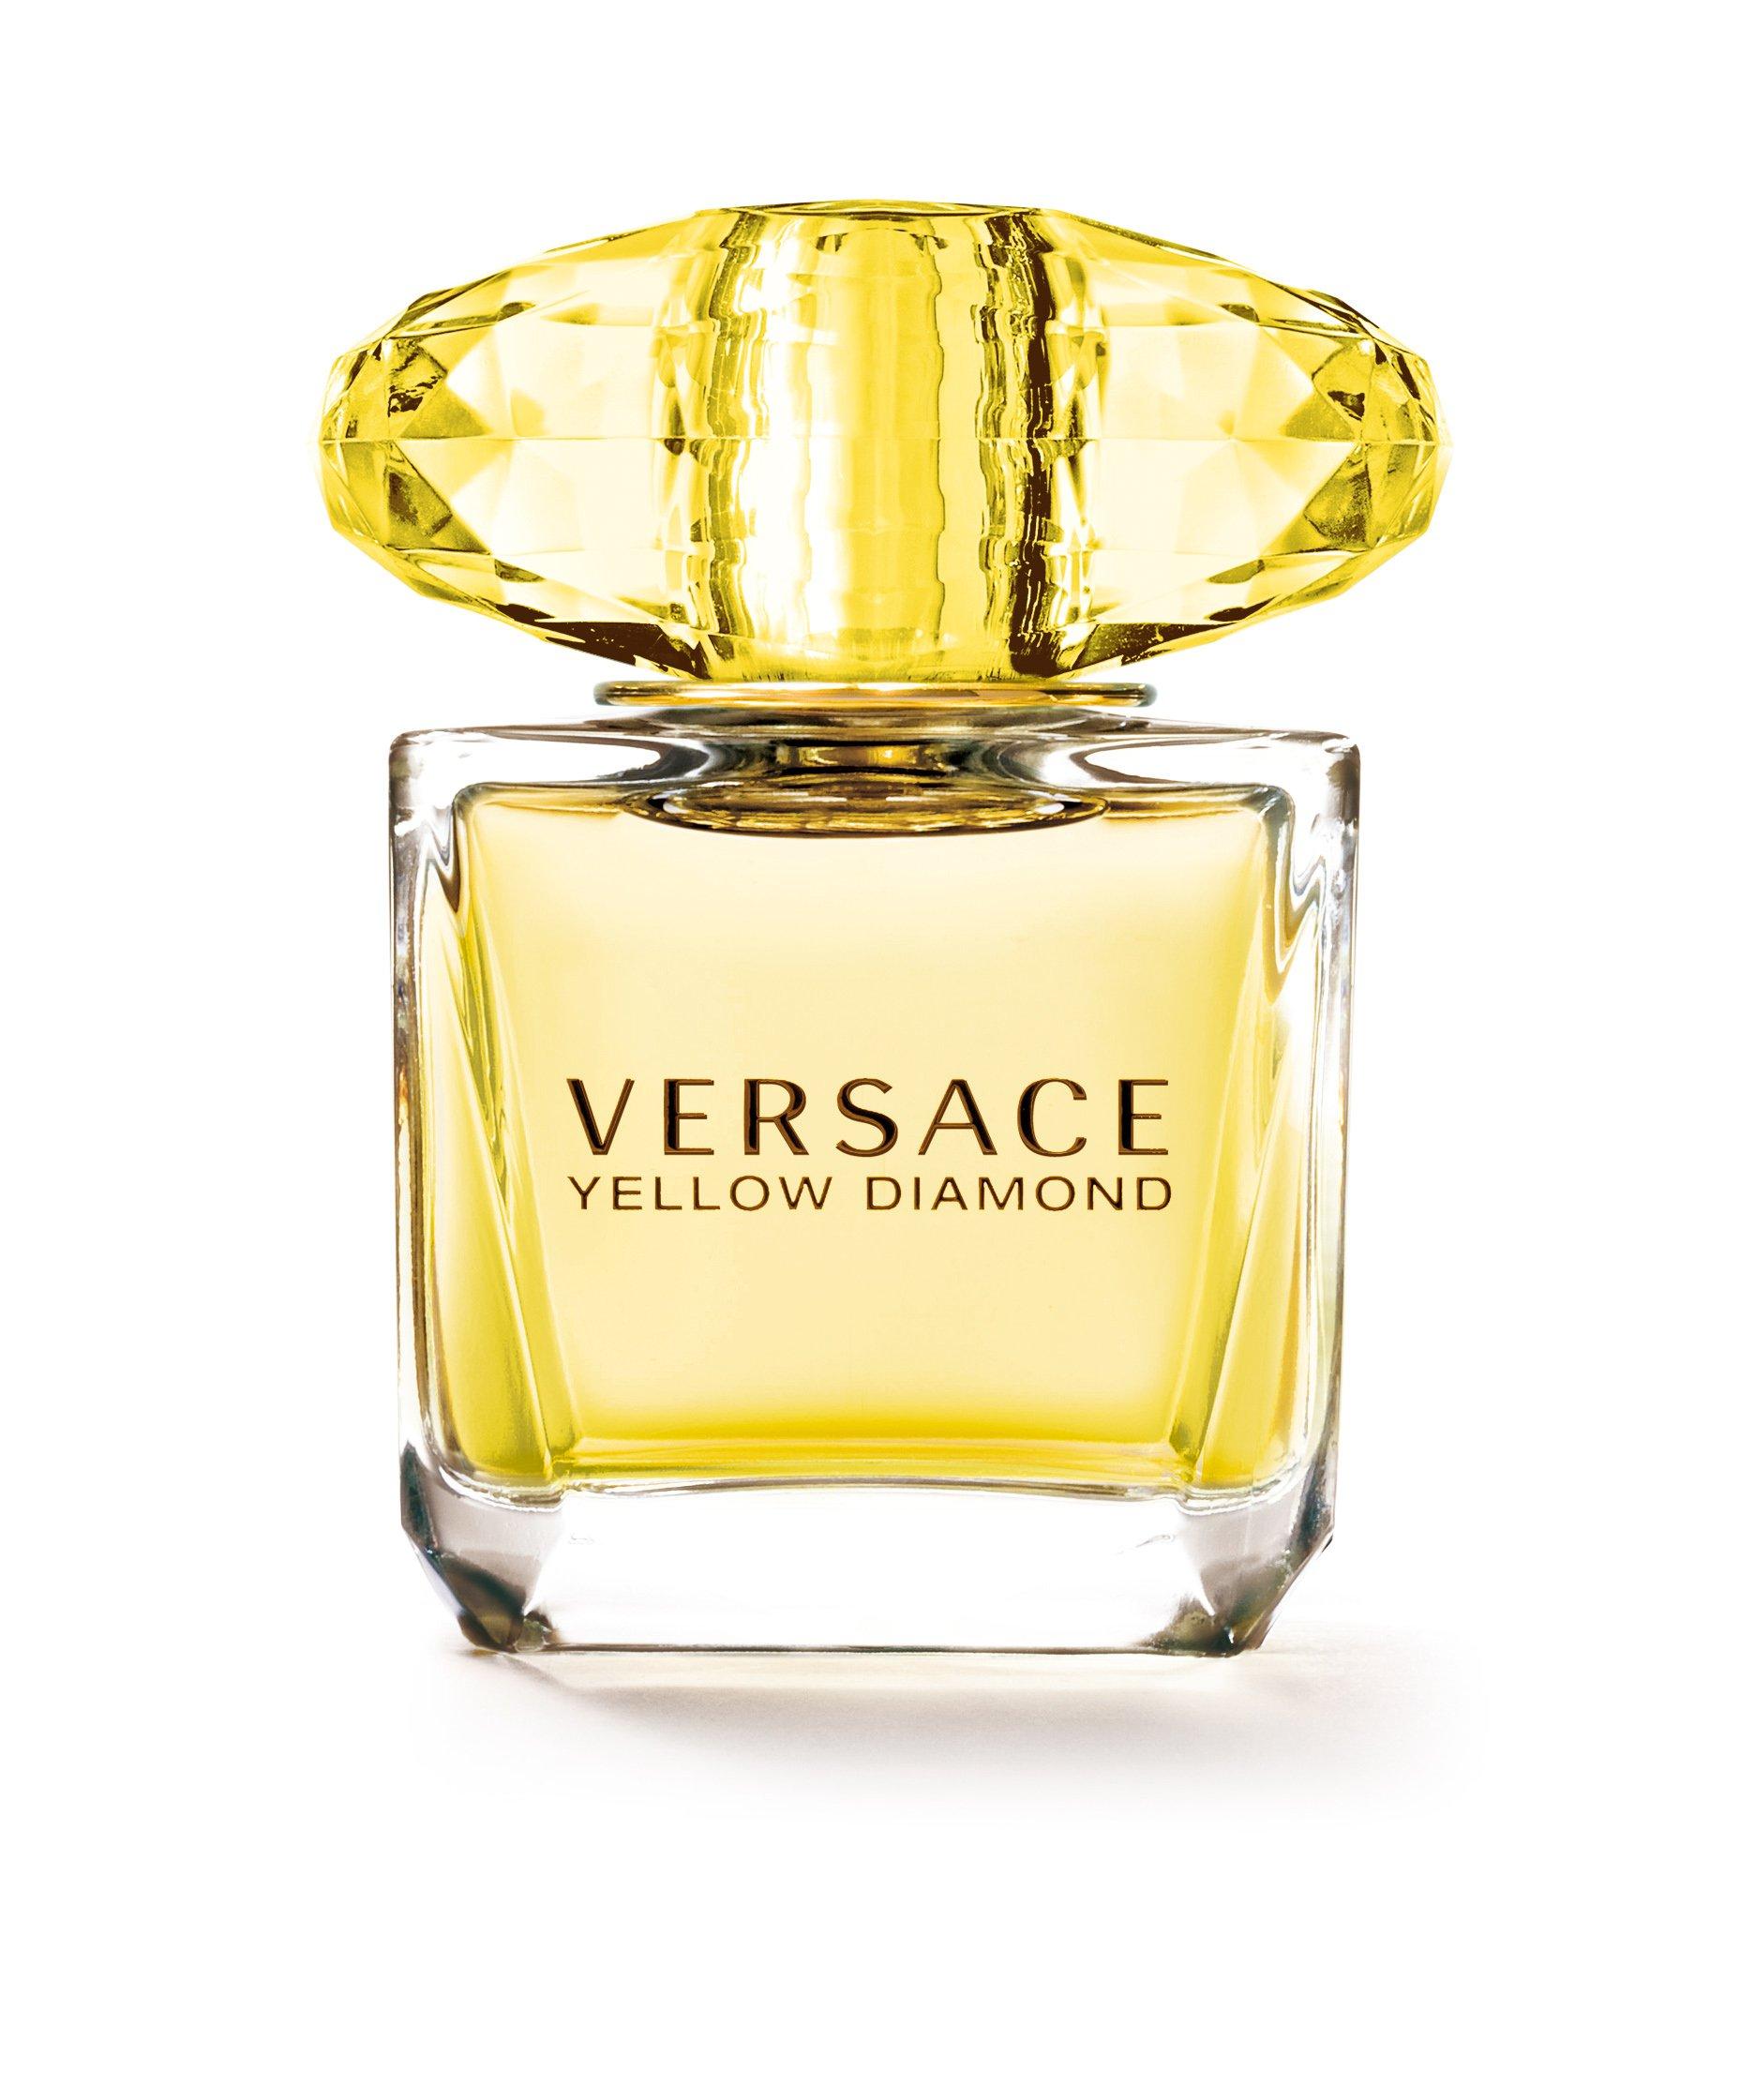 Versace Eau de Toilette Spray, Yellow Diamonds, 1.0 Fluid Ounce